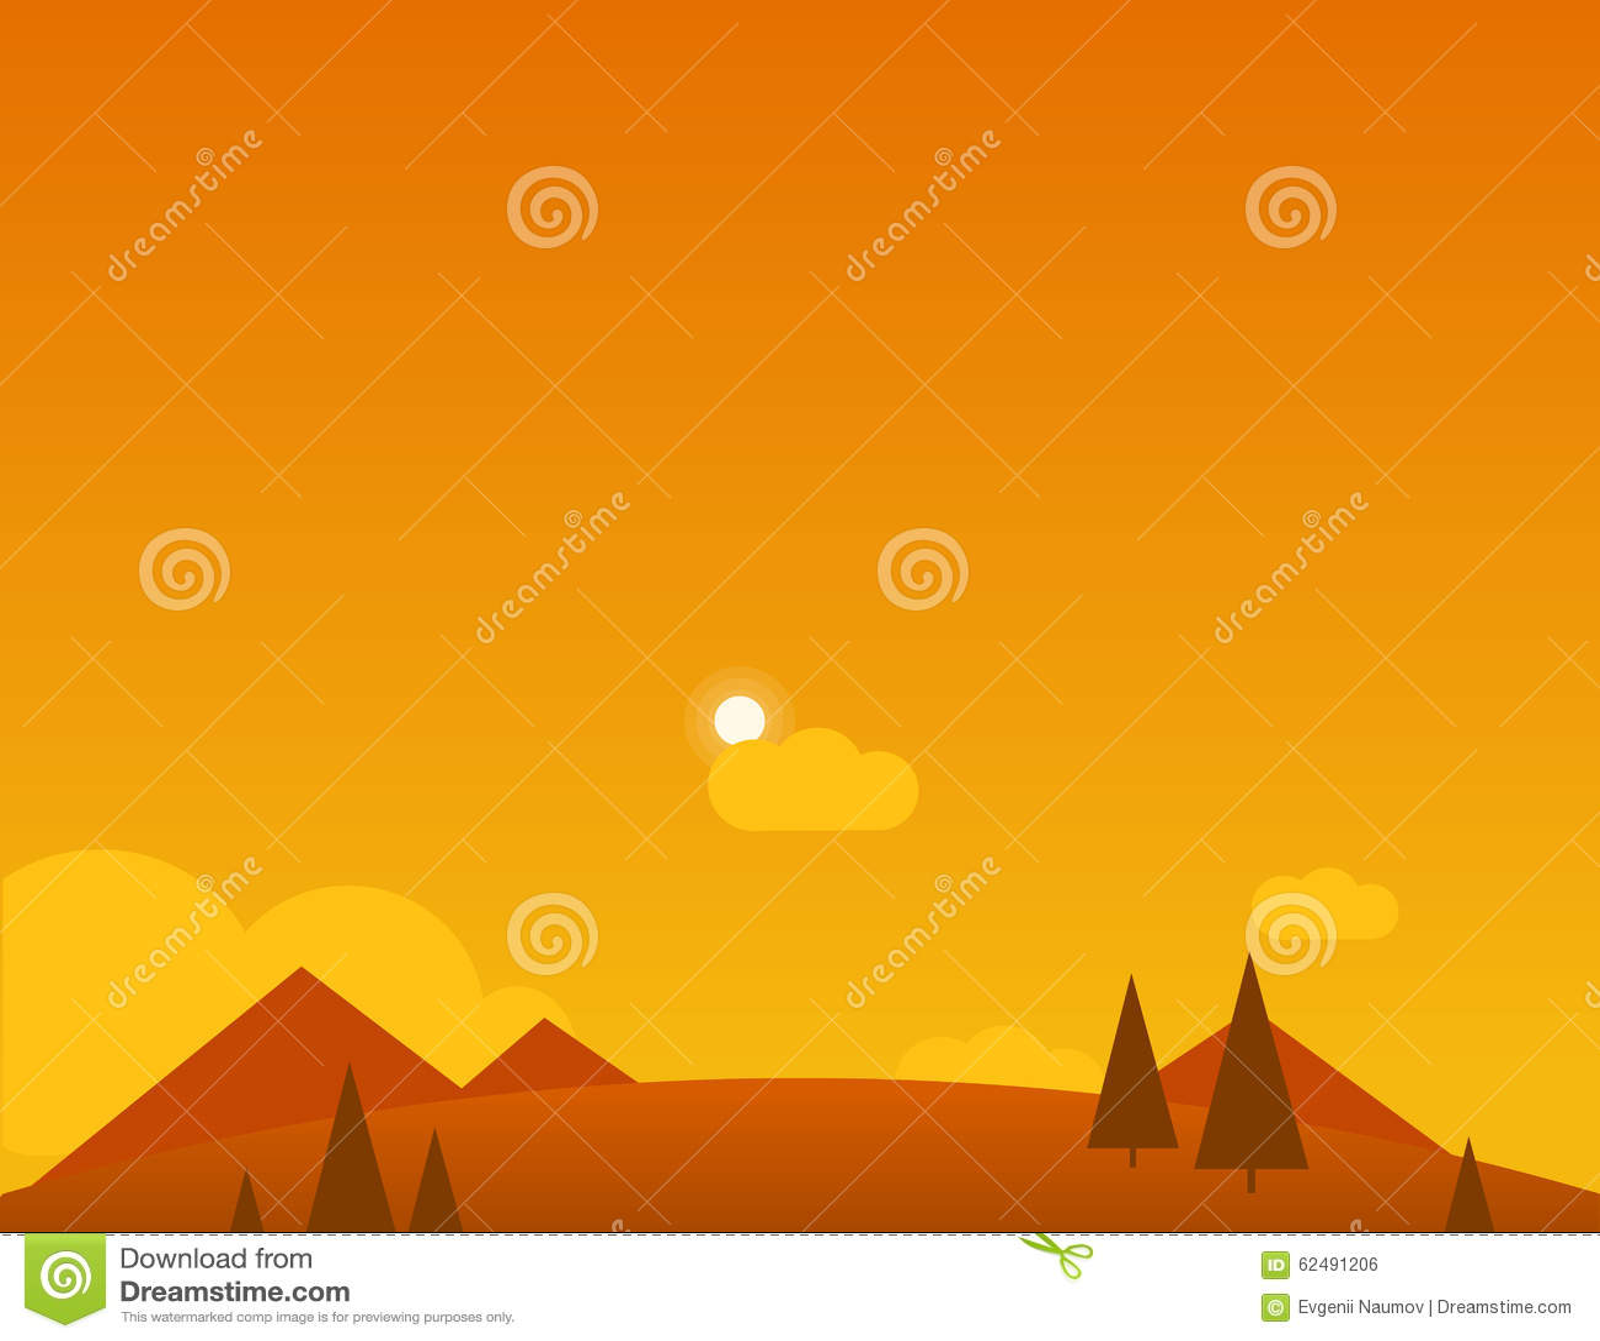 Wallpaper Landscape Of Desert Mountains And Sun